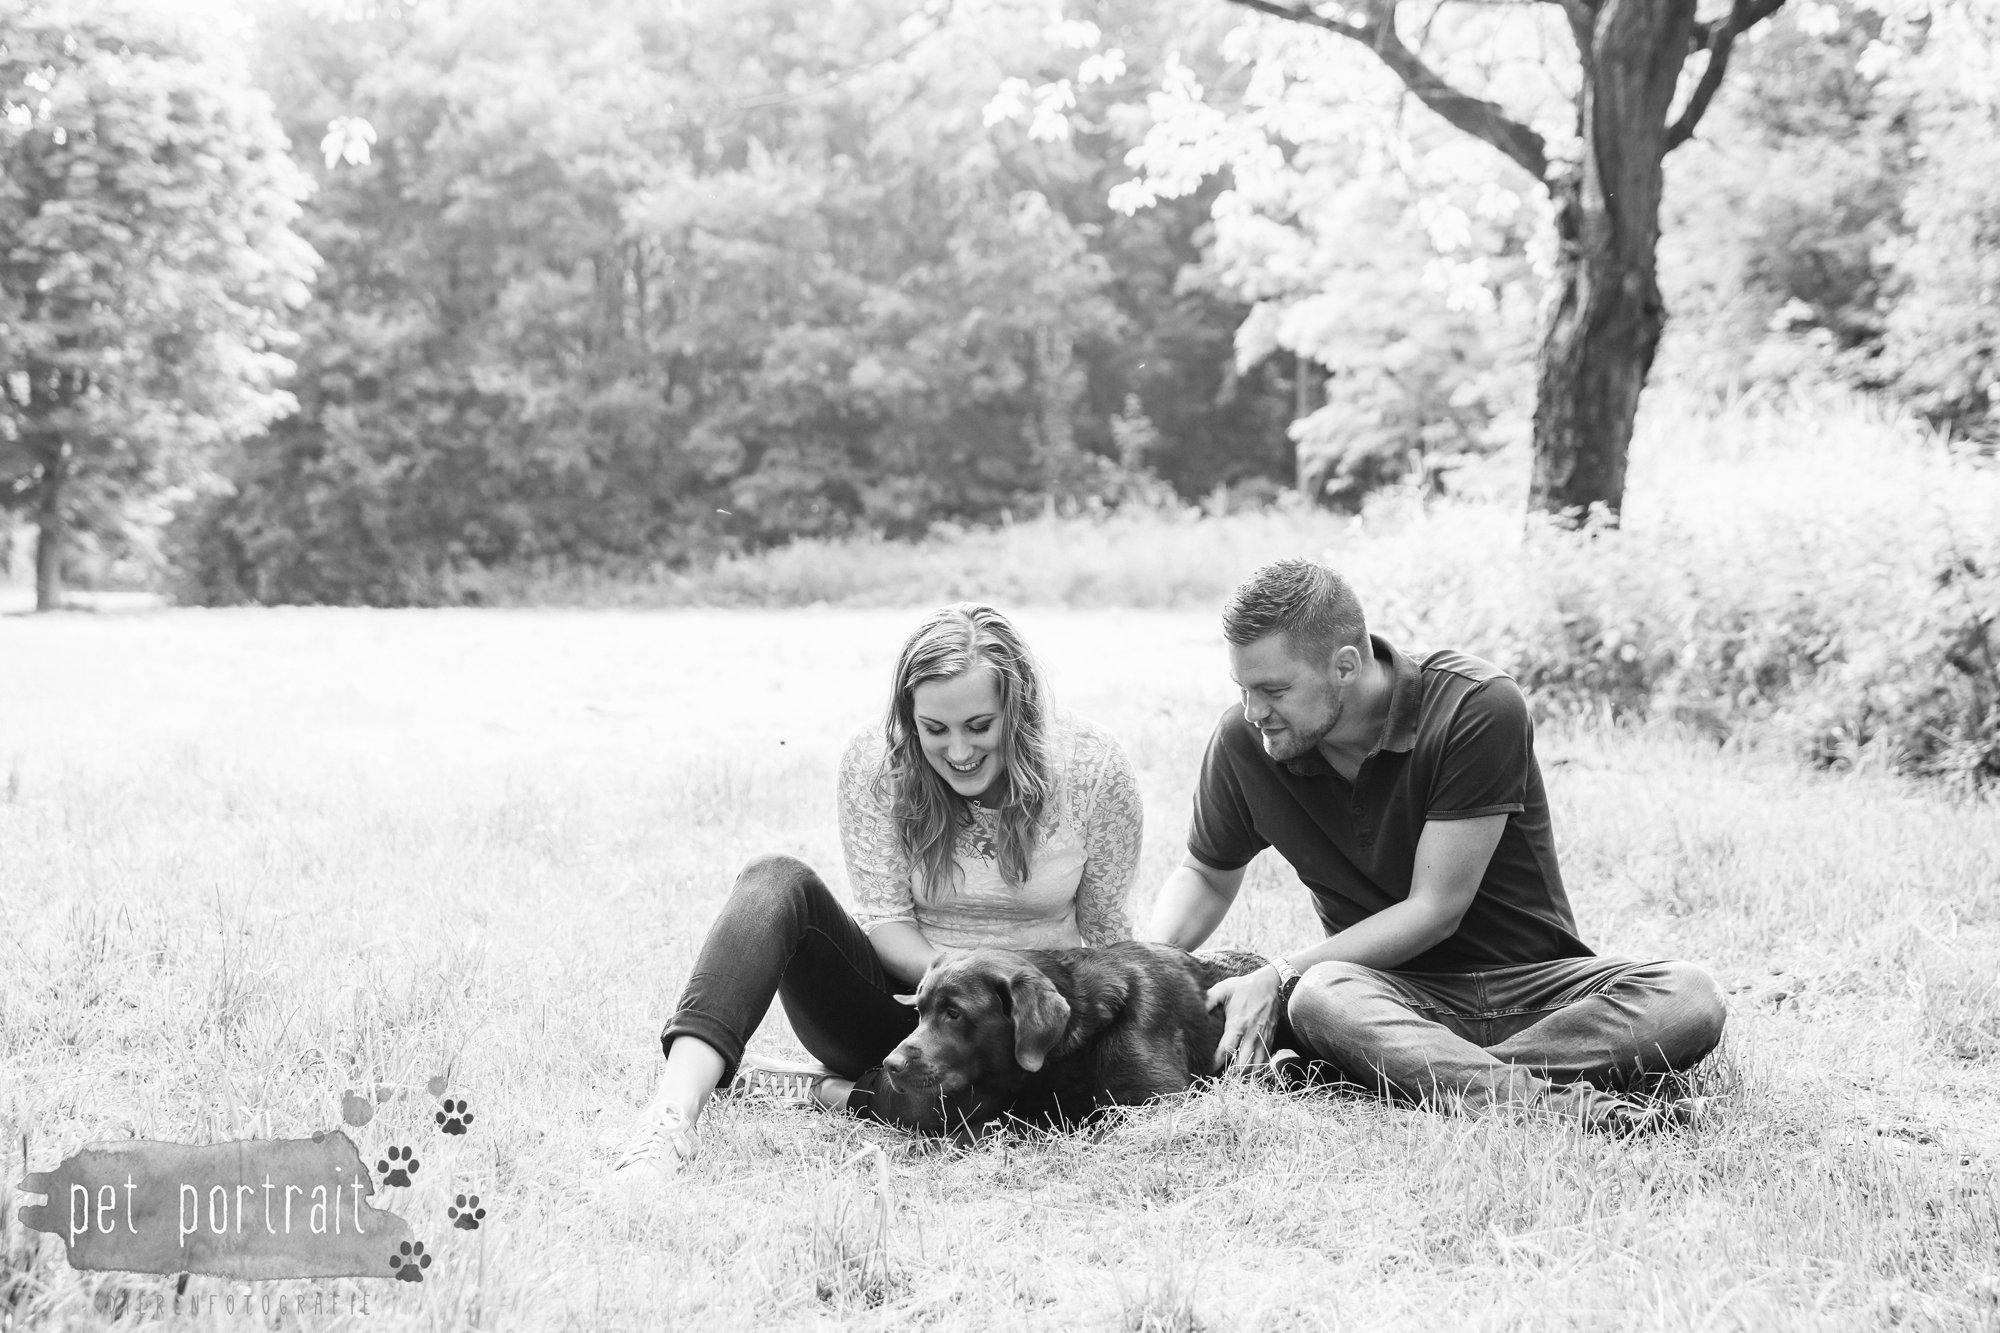 Hondenfotograaf Lelystad - Beloved Dier en Baasje fotoshoot-4